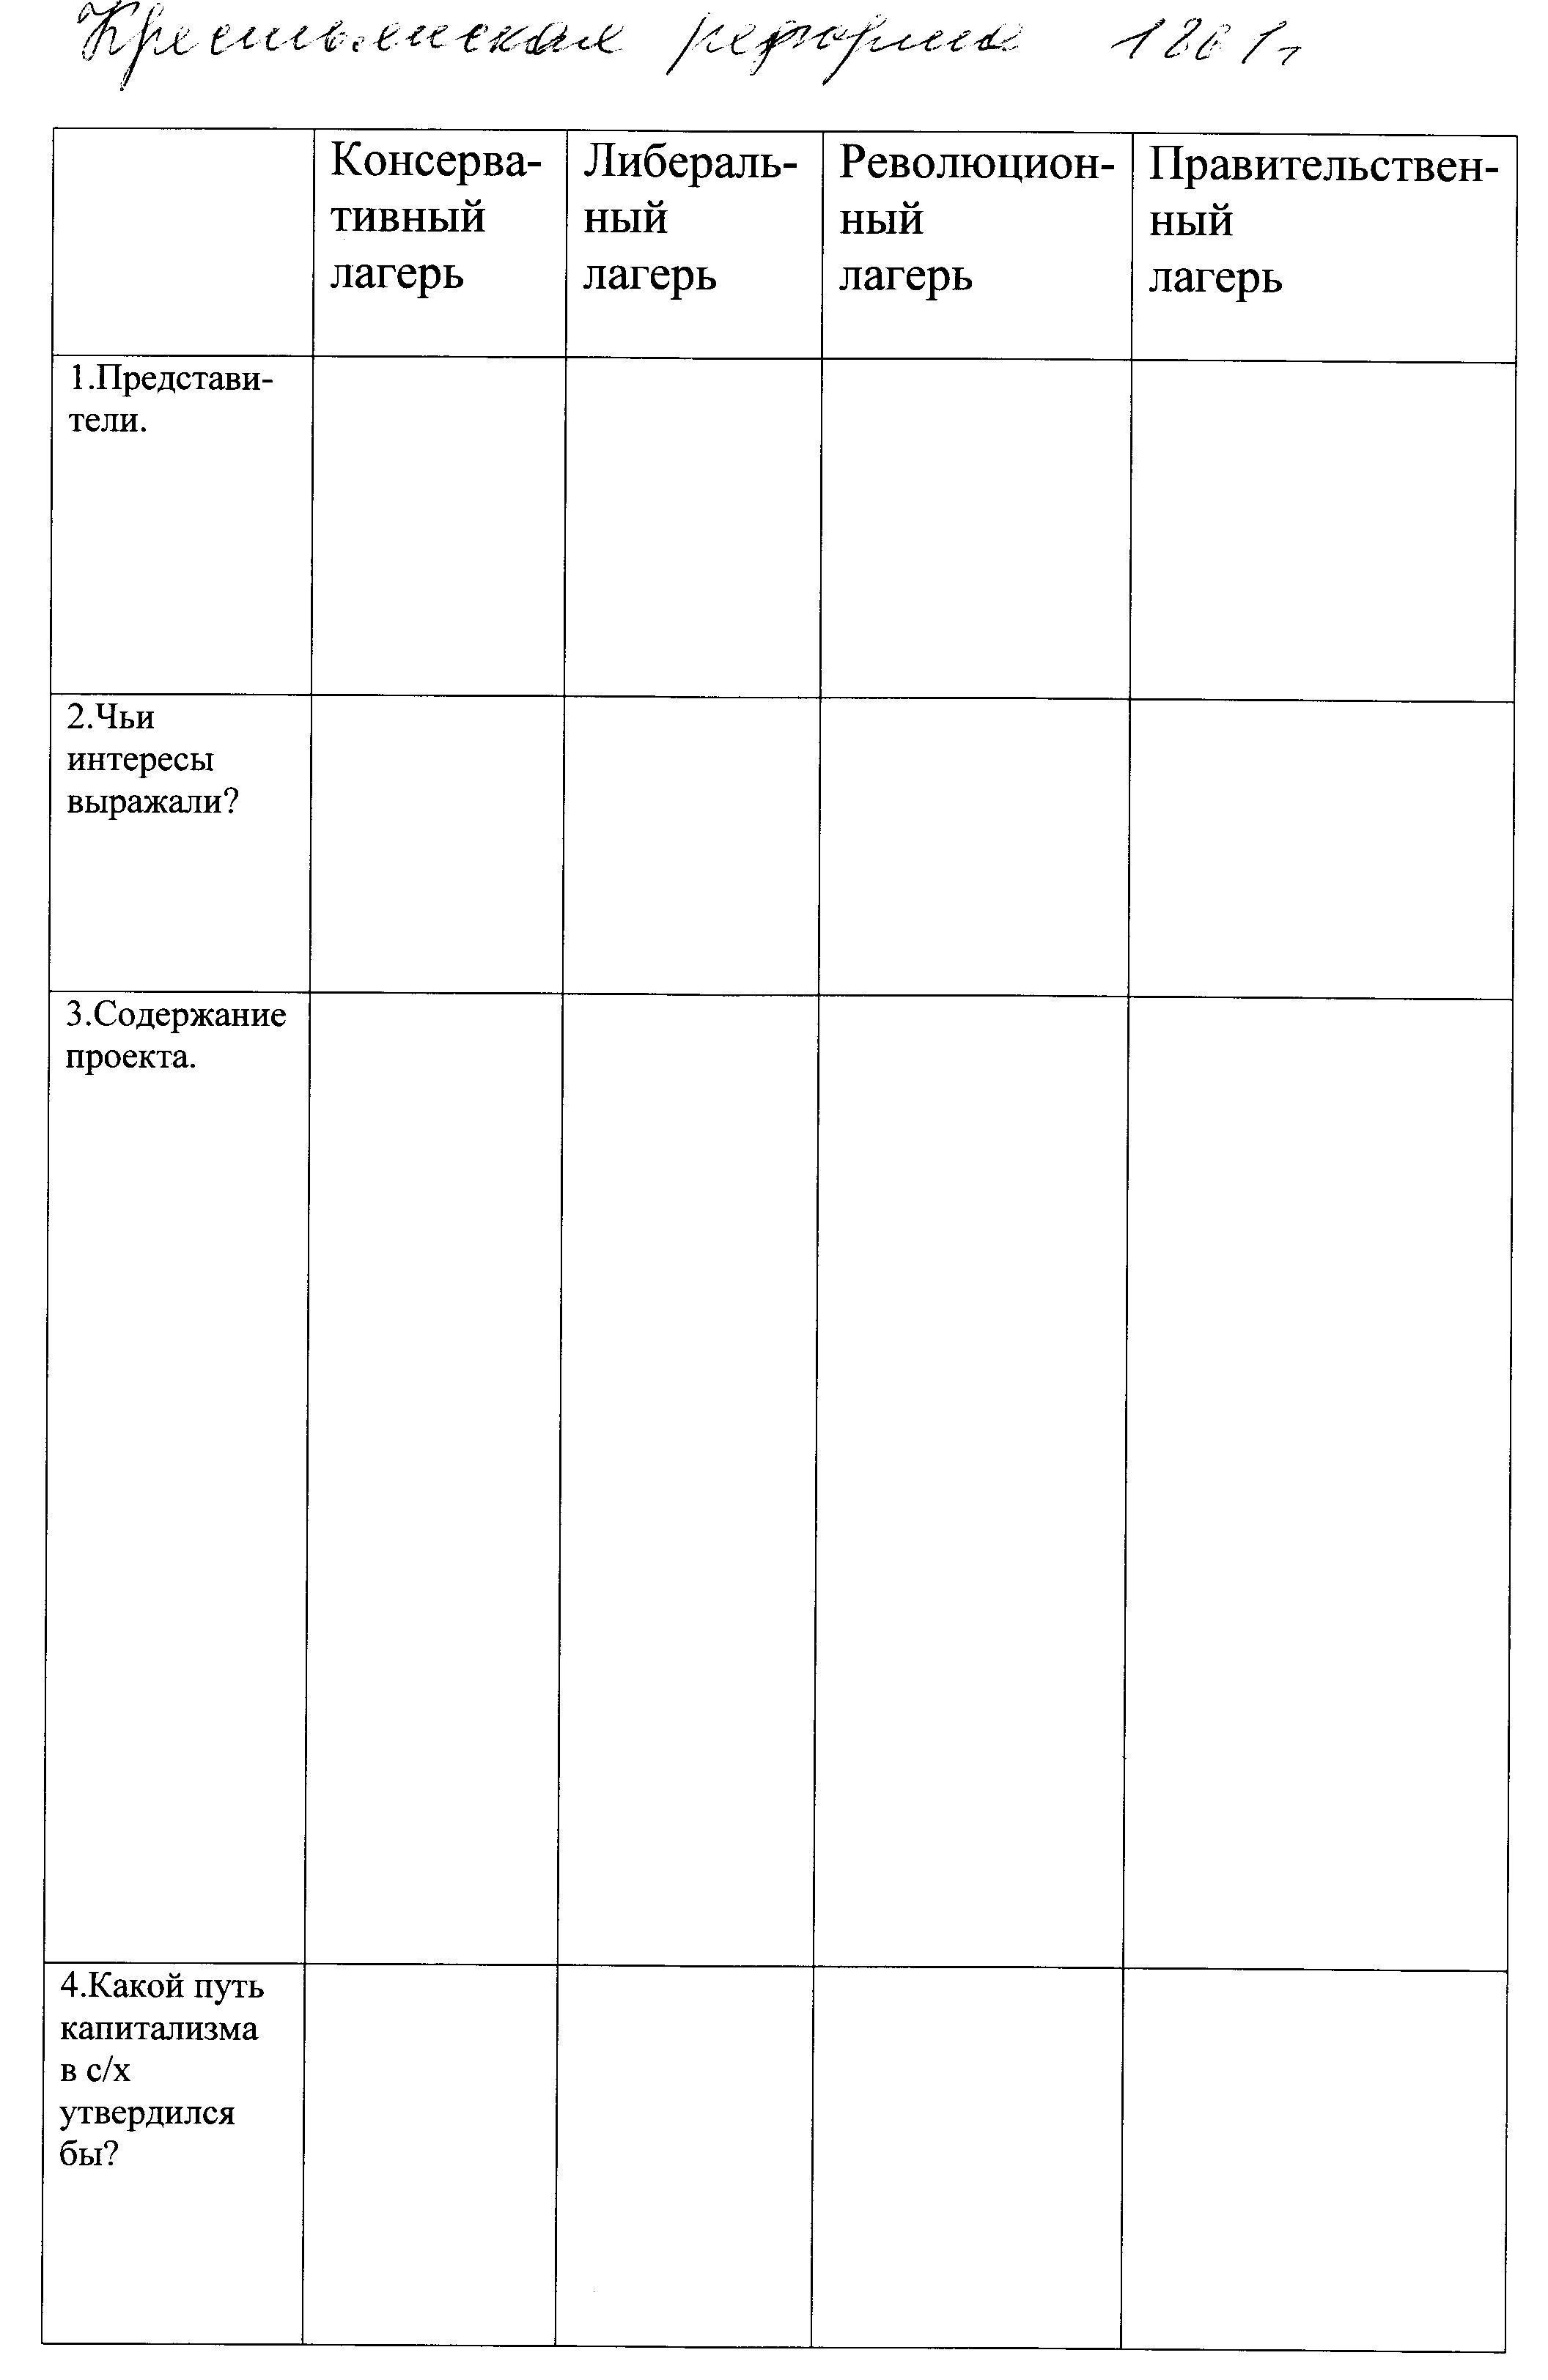 G:\Аттестация 2013\Таблица различных проектов.jpg